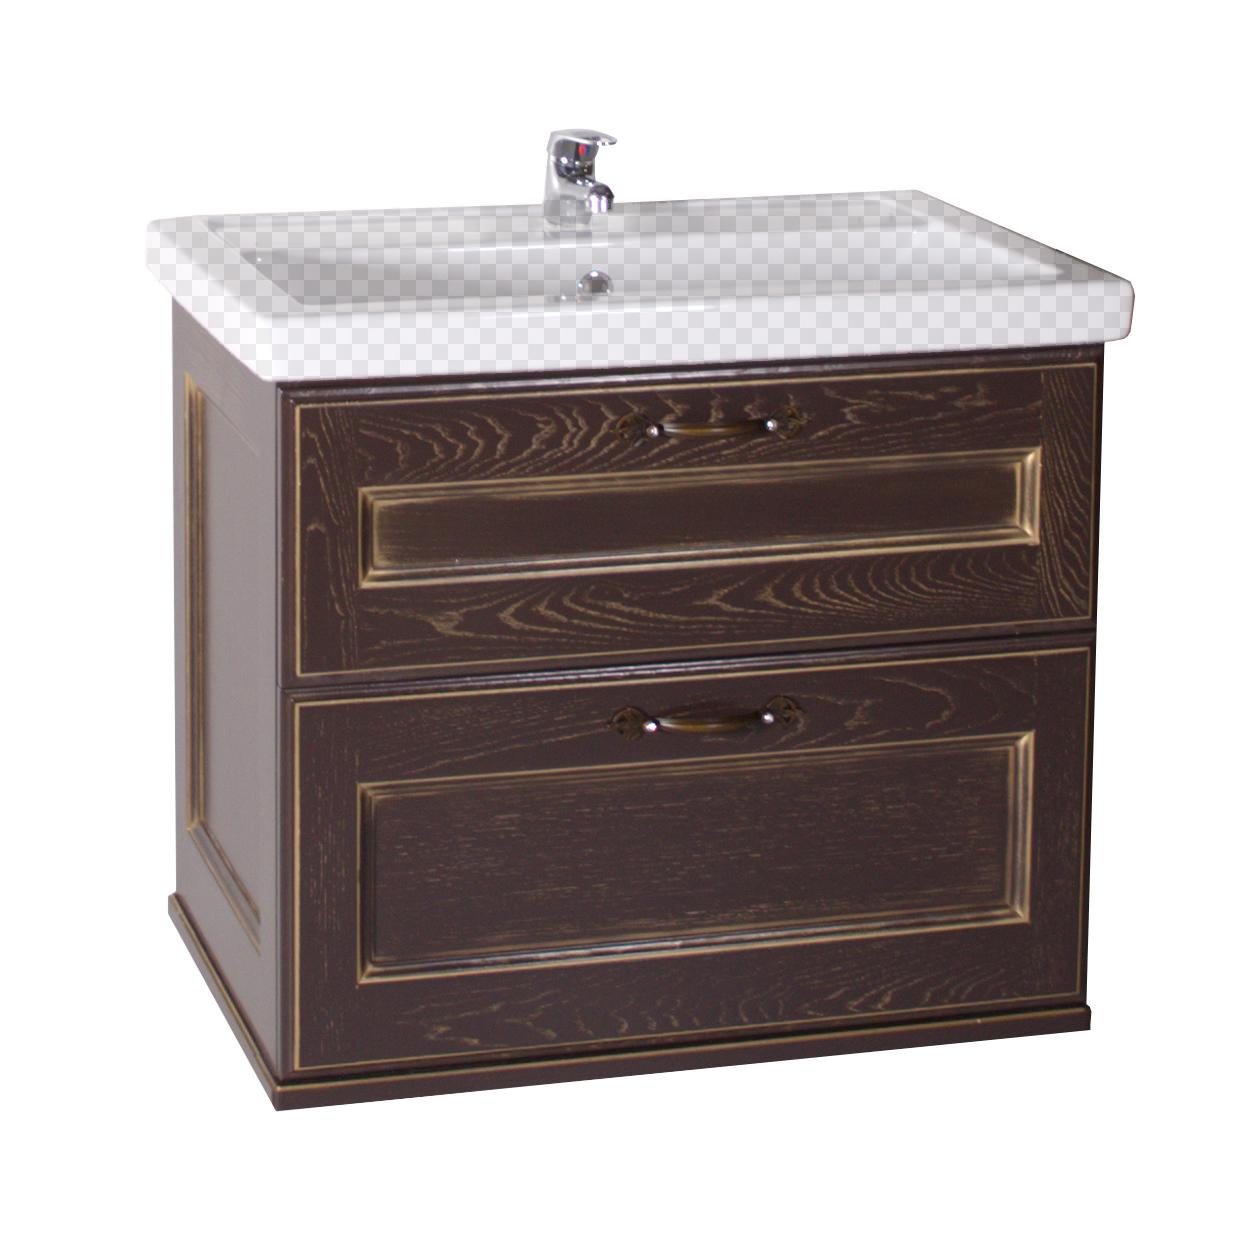 Тумба под раковину АСБ мебель Прато 70 Woodline орех/патина золото мебель 70